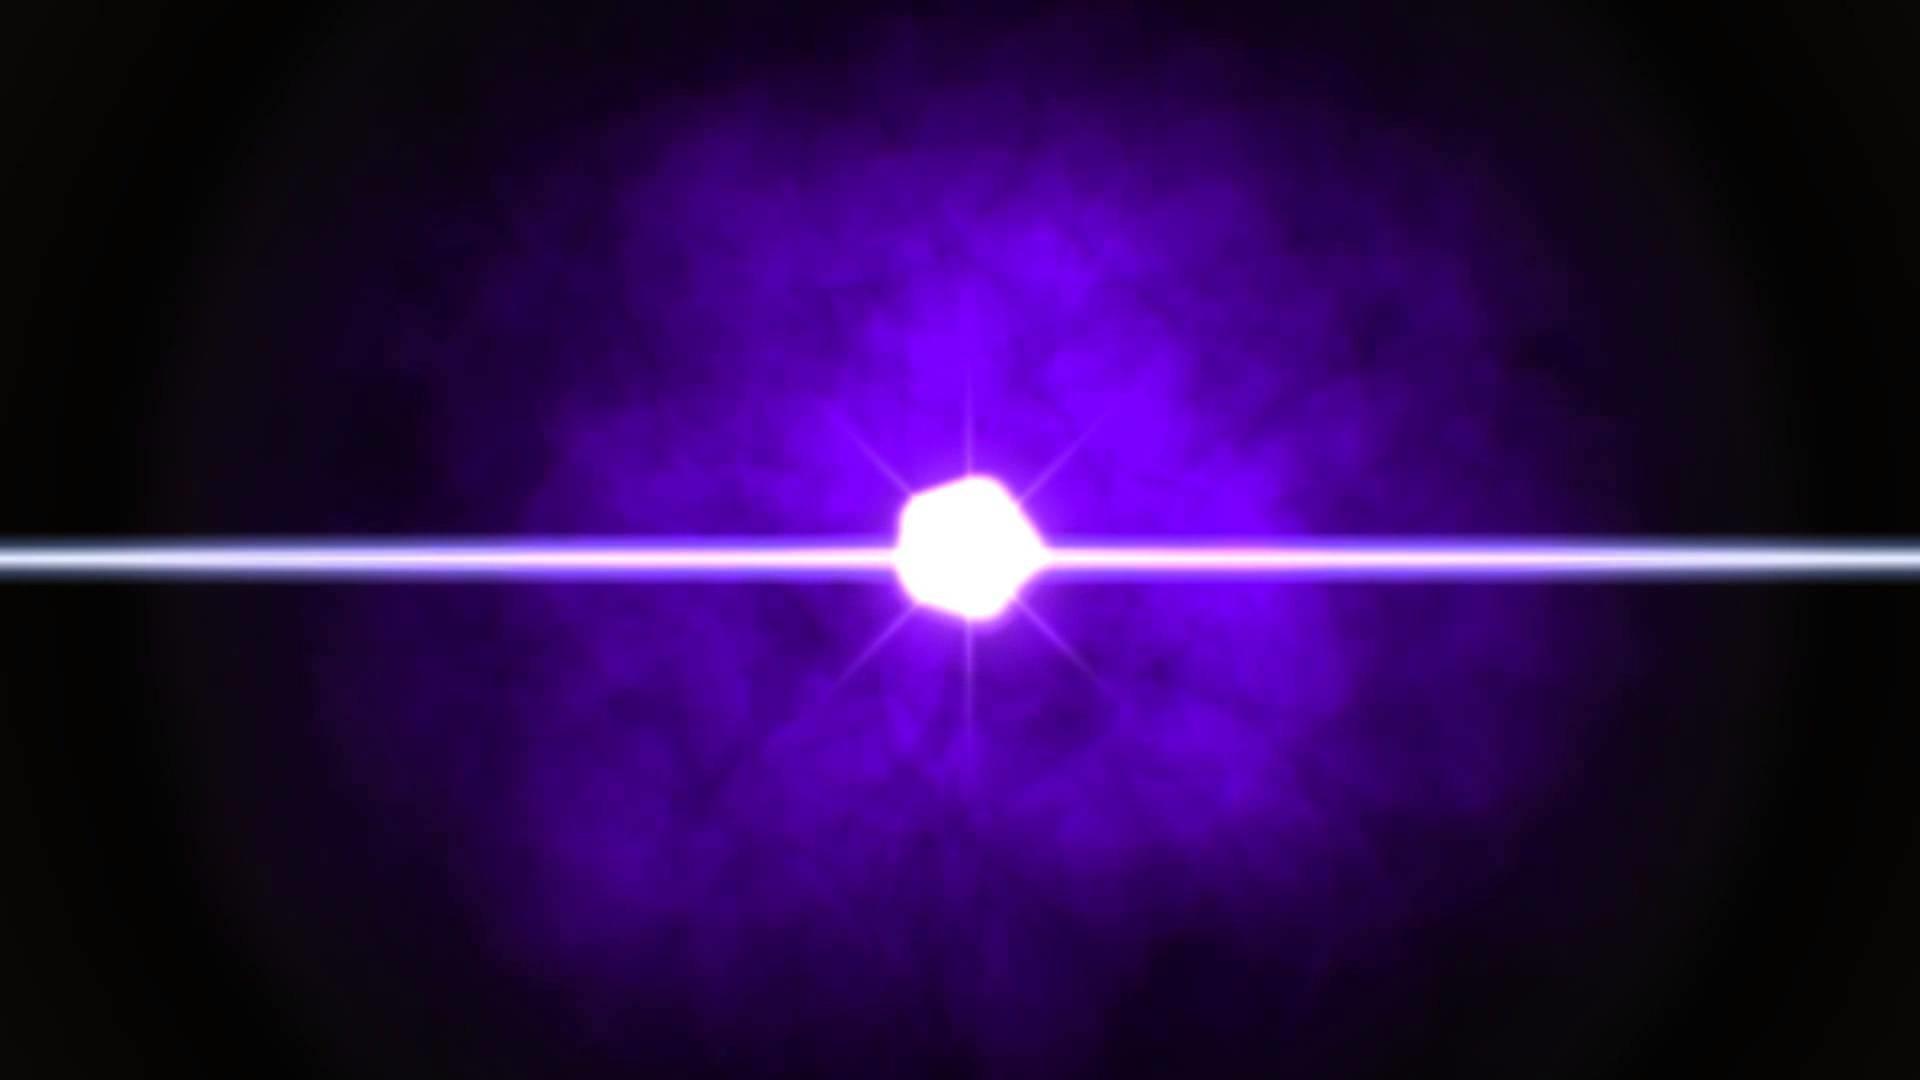 Purple Round Lens Flare Black Background 26 ANIMATION FREE FOOTAGE HD –  YouTube